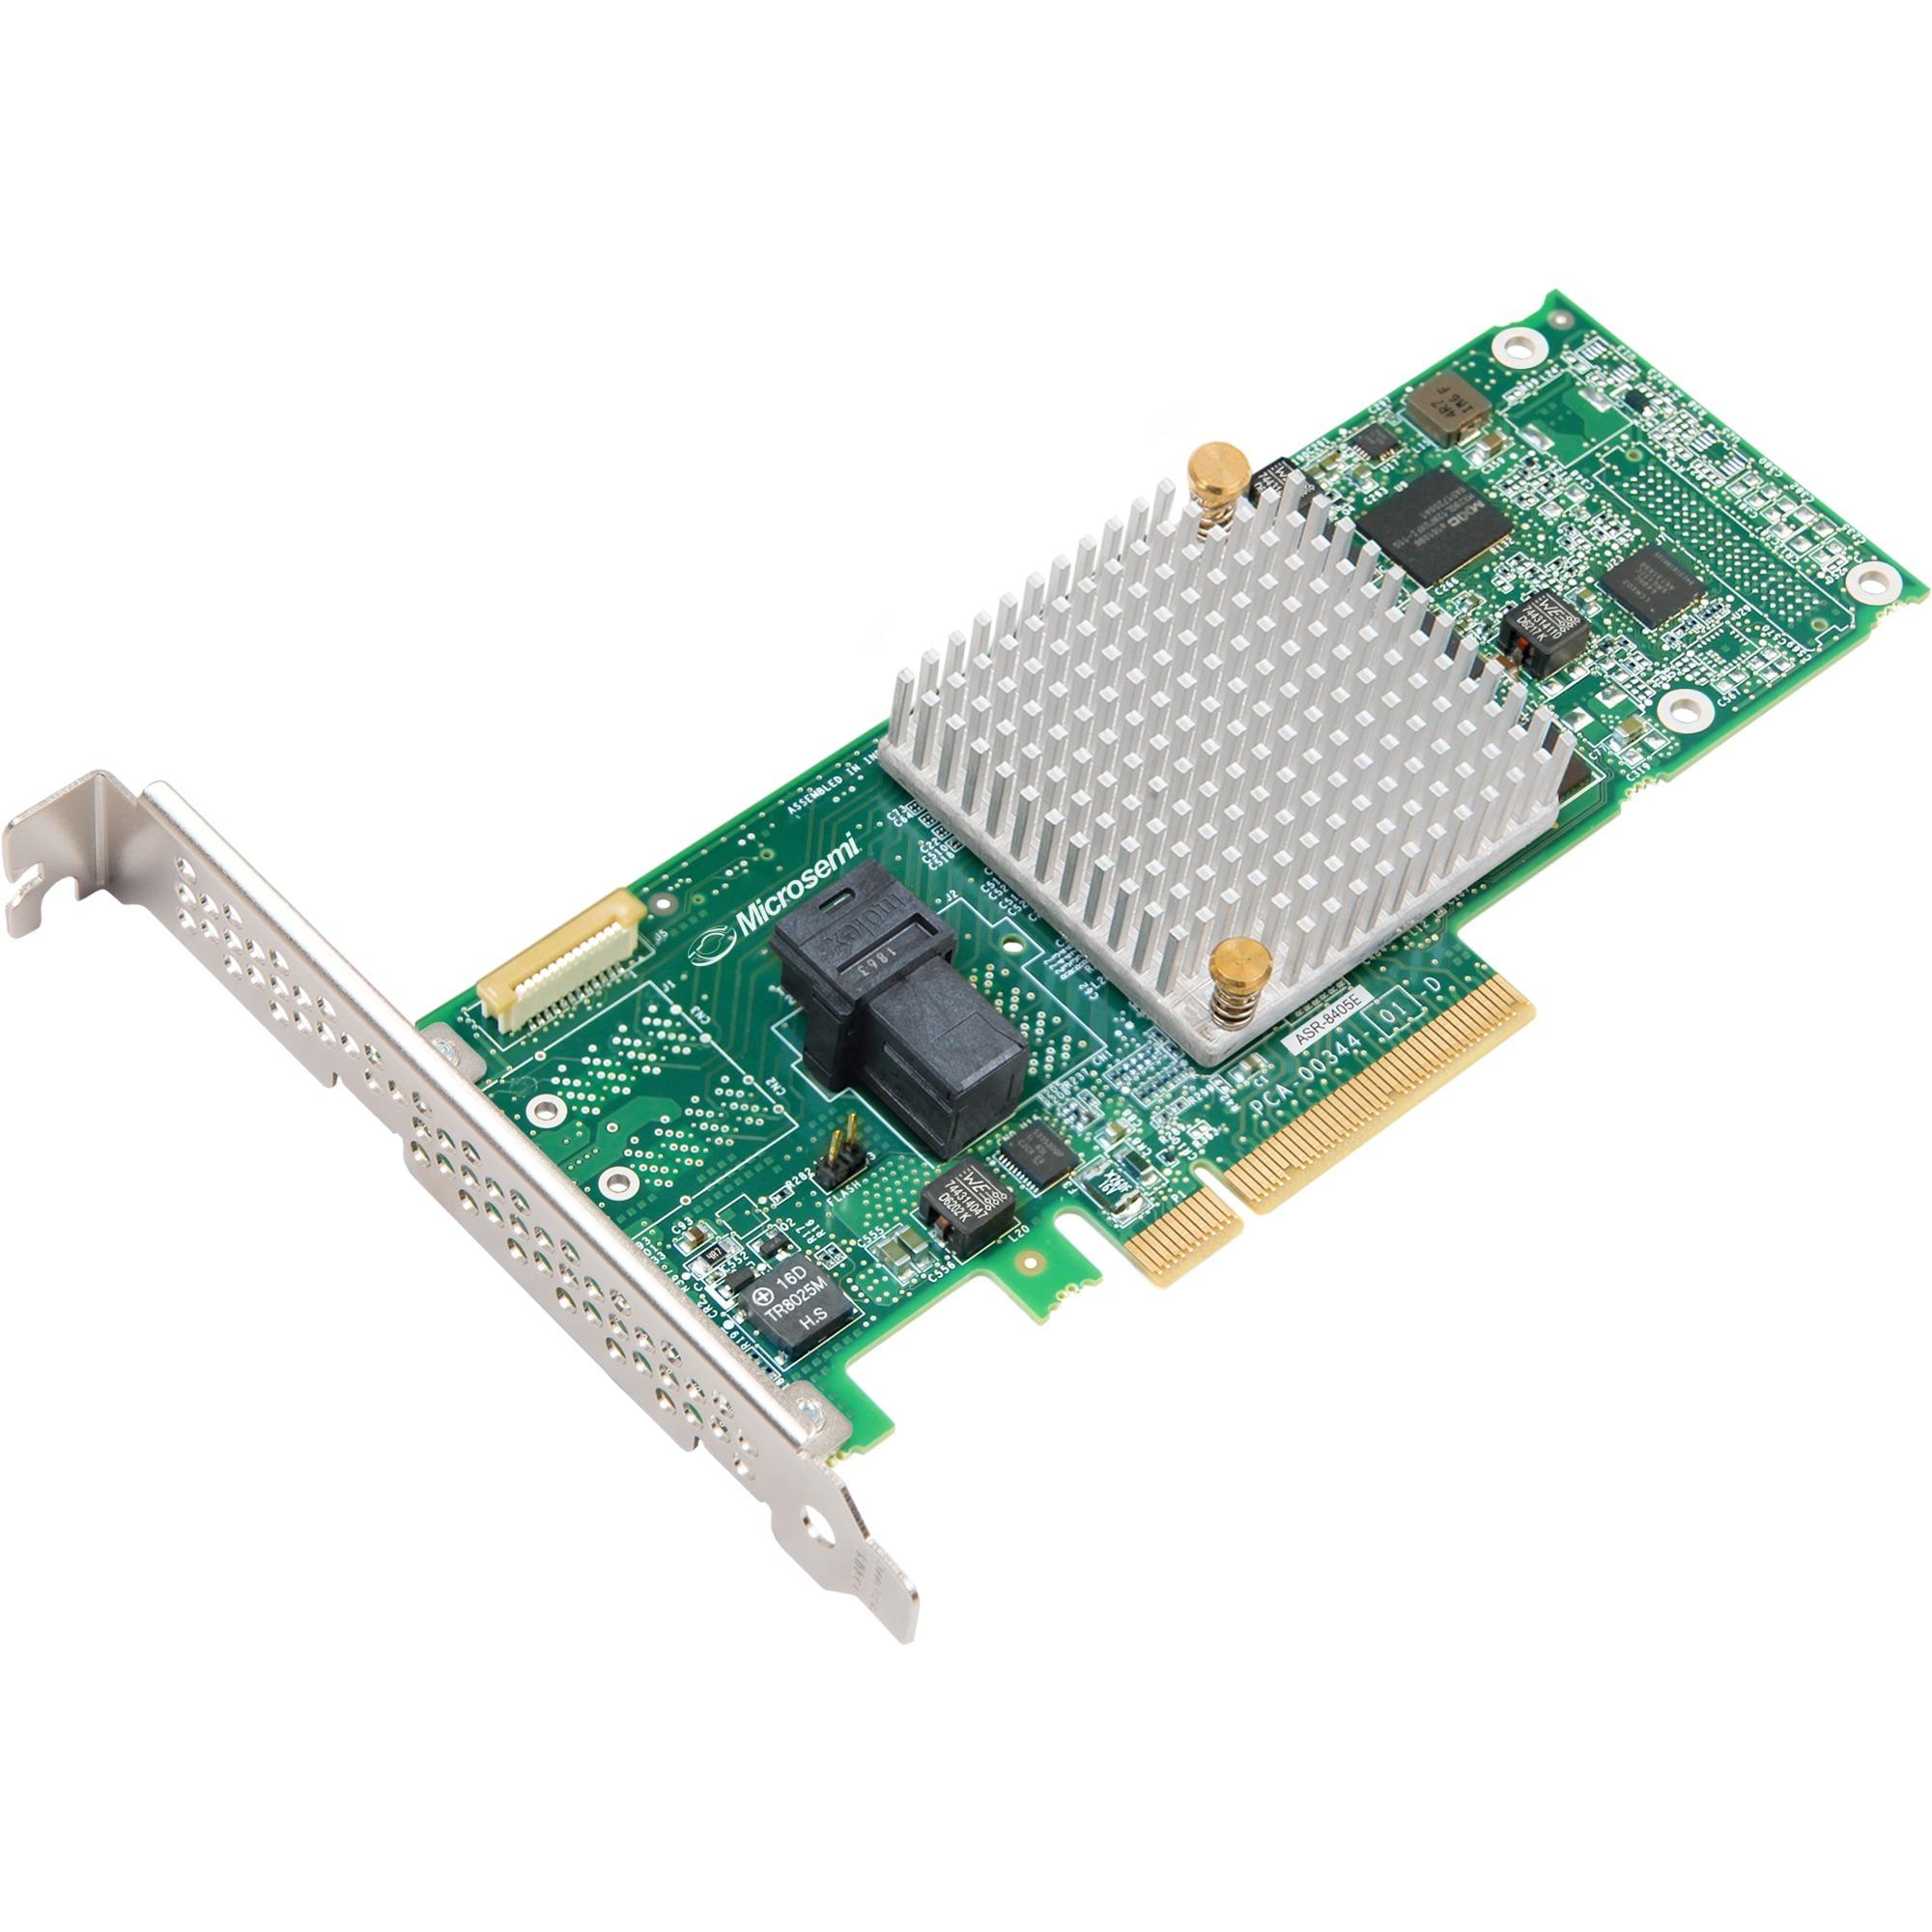 8405E controlado RAID PCI Express x8 3.0 12 Gbit/s, Controlador ATA serie